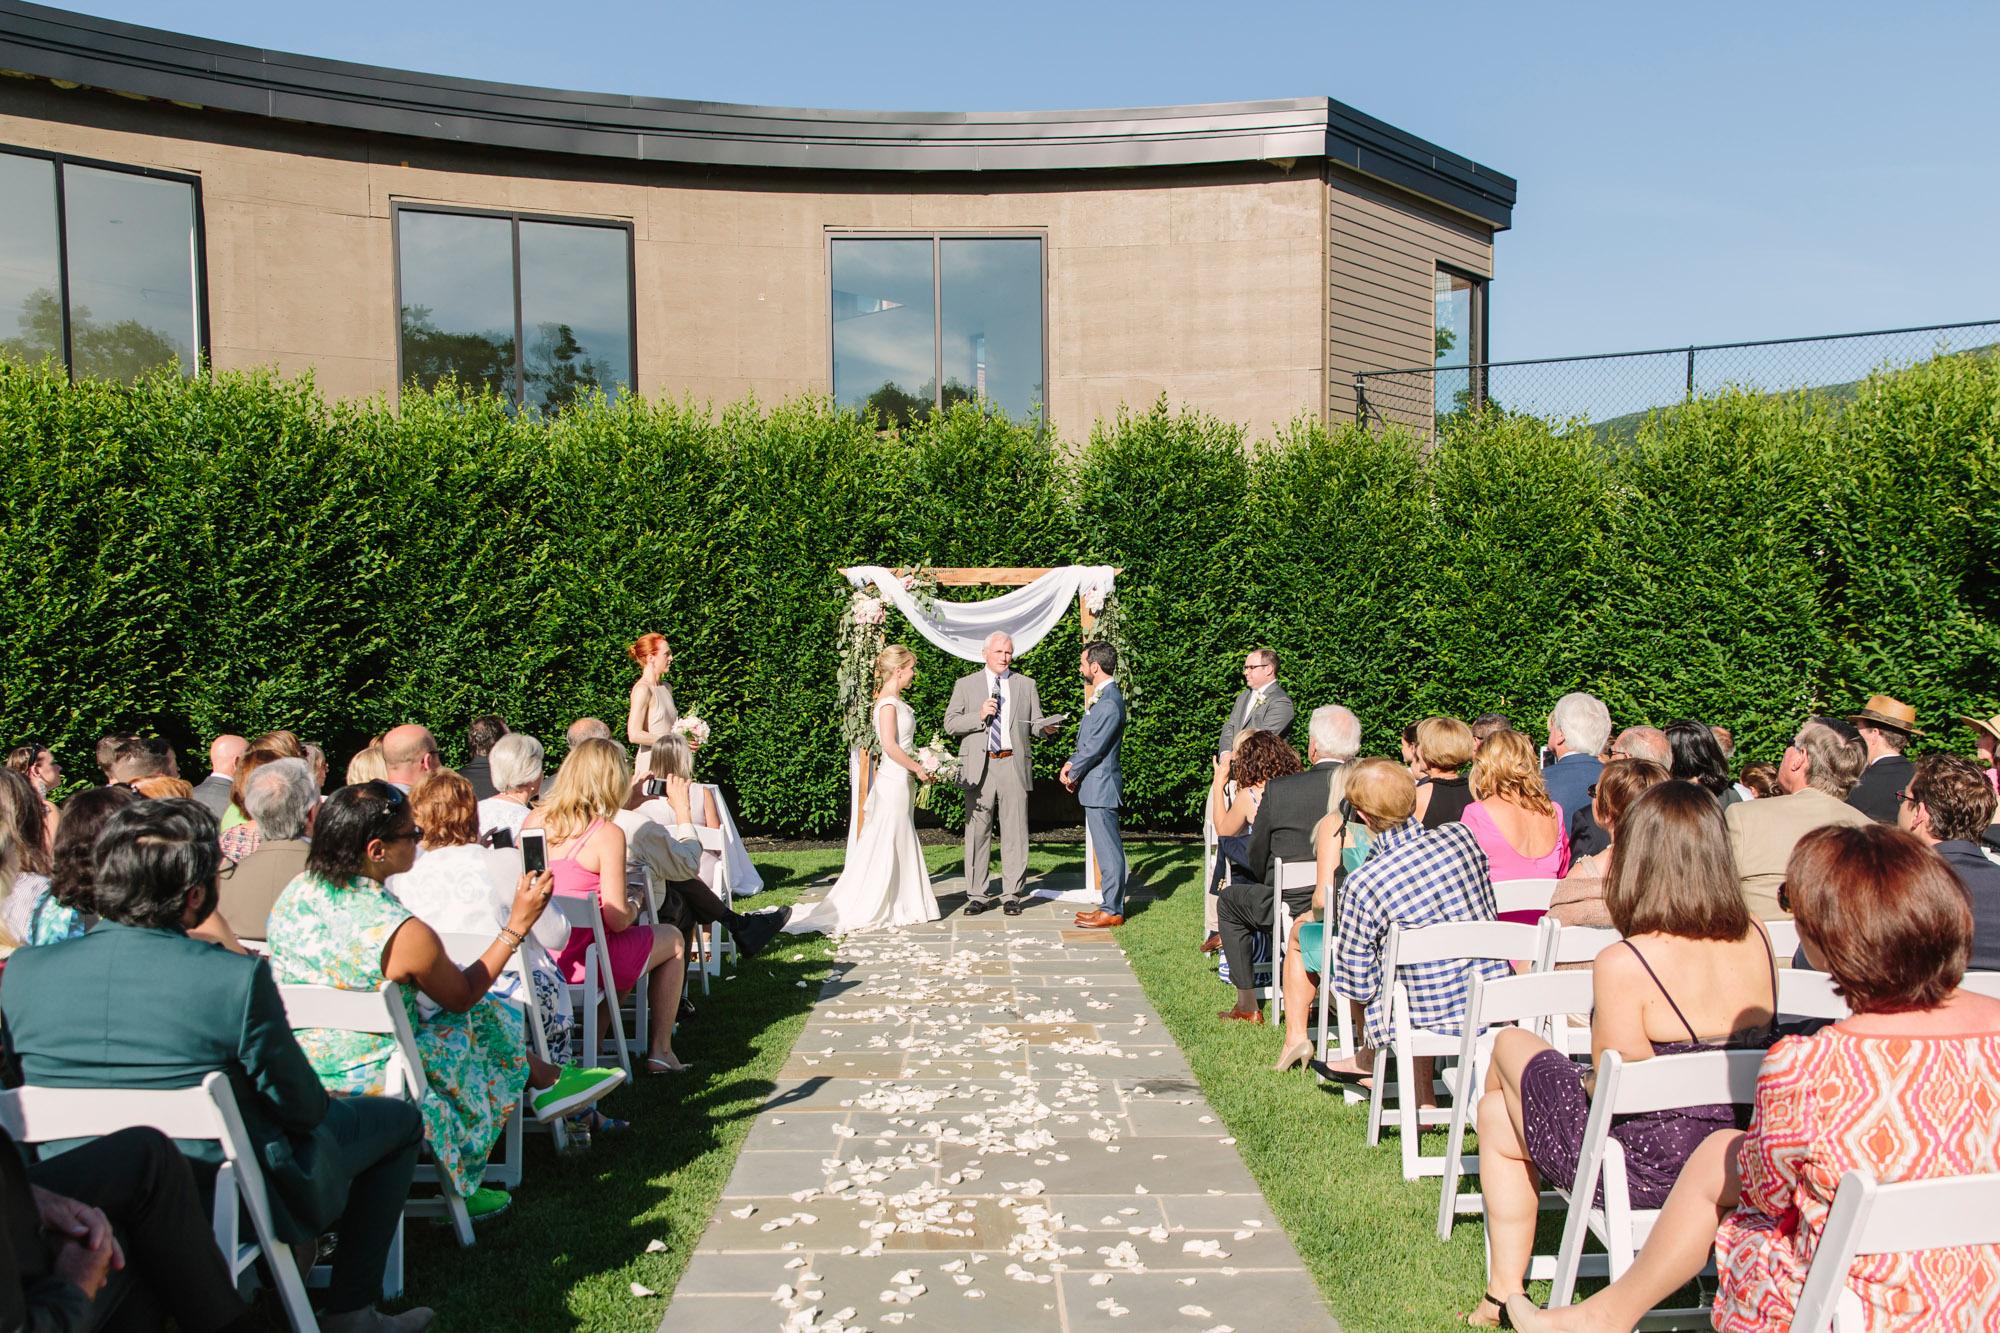 46_Rowan_Brian_The_Roundhouse_Wedding_Beacon_NY_Tanya_Salazar_Photography_524.jpg